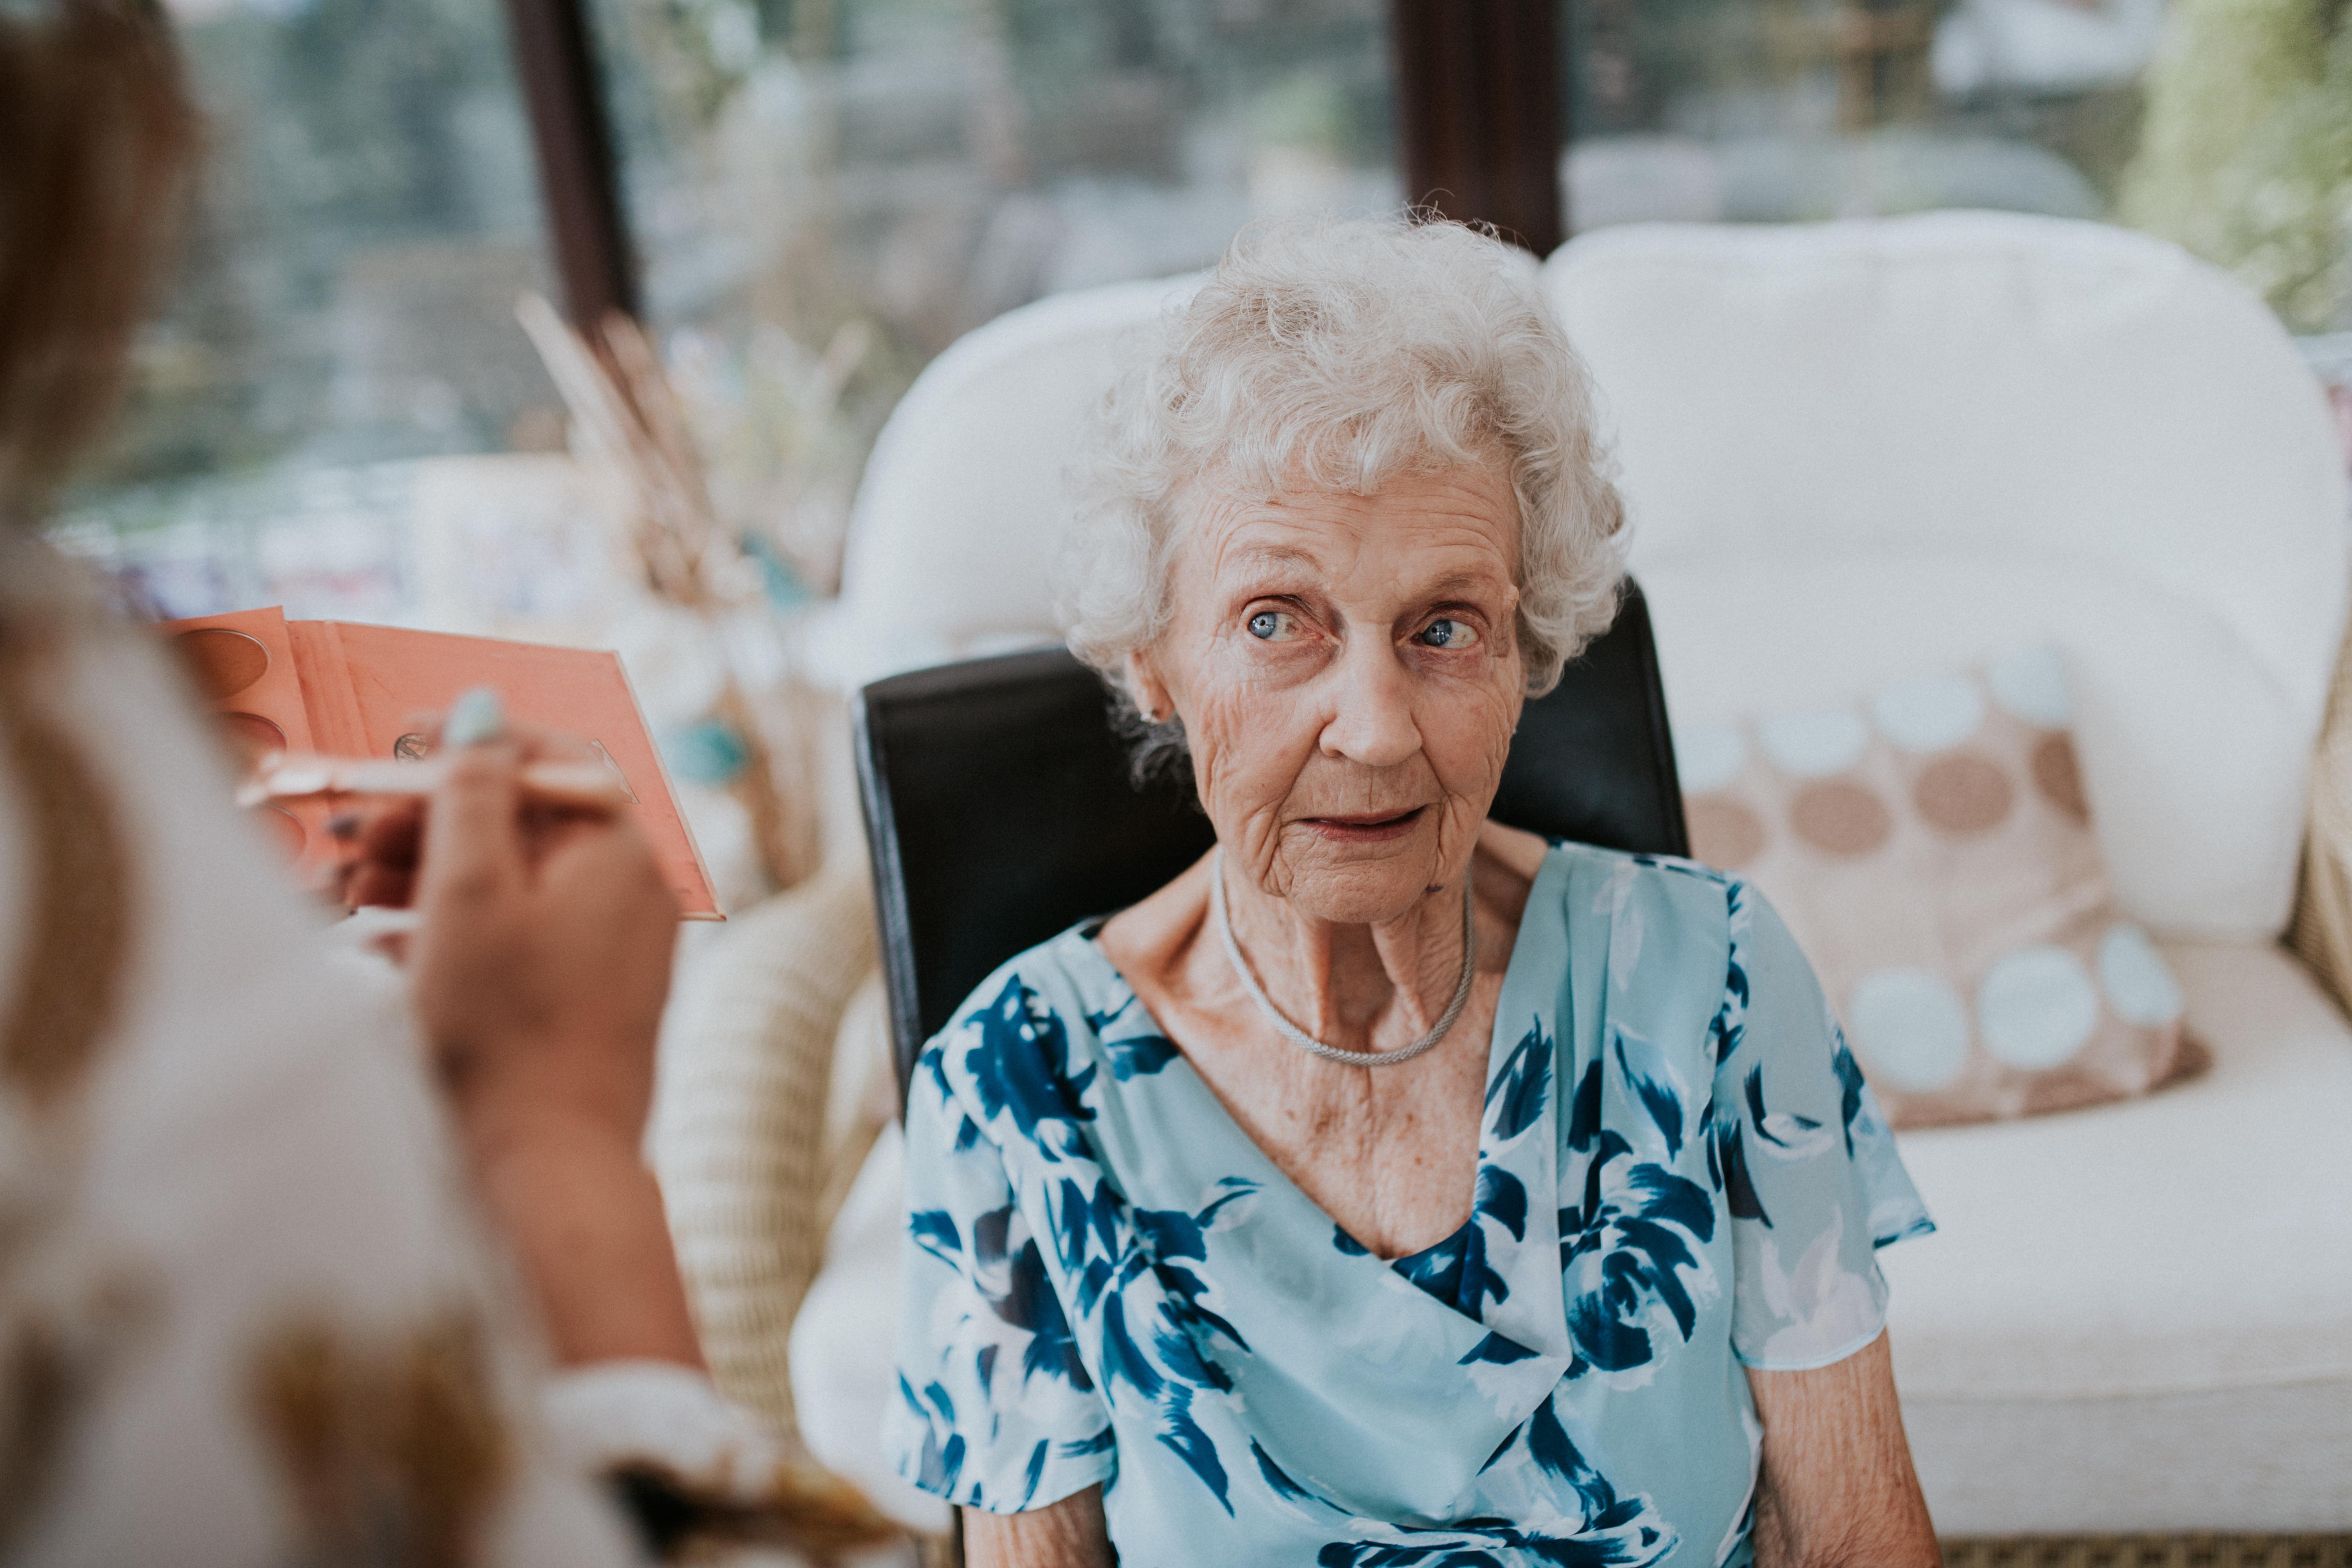 nan having her make-up done